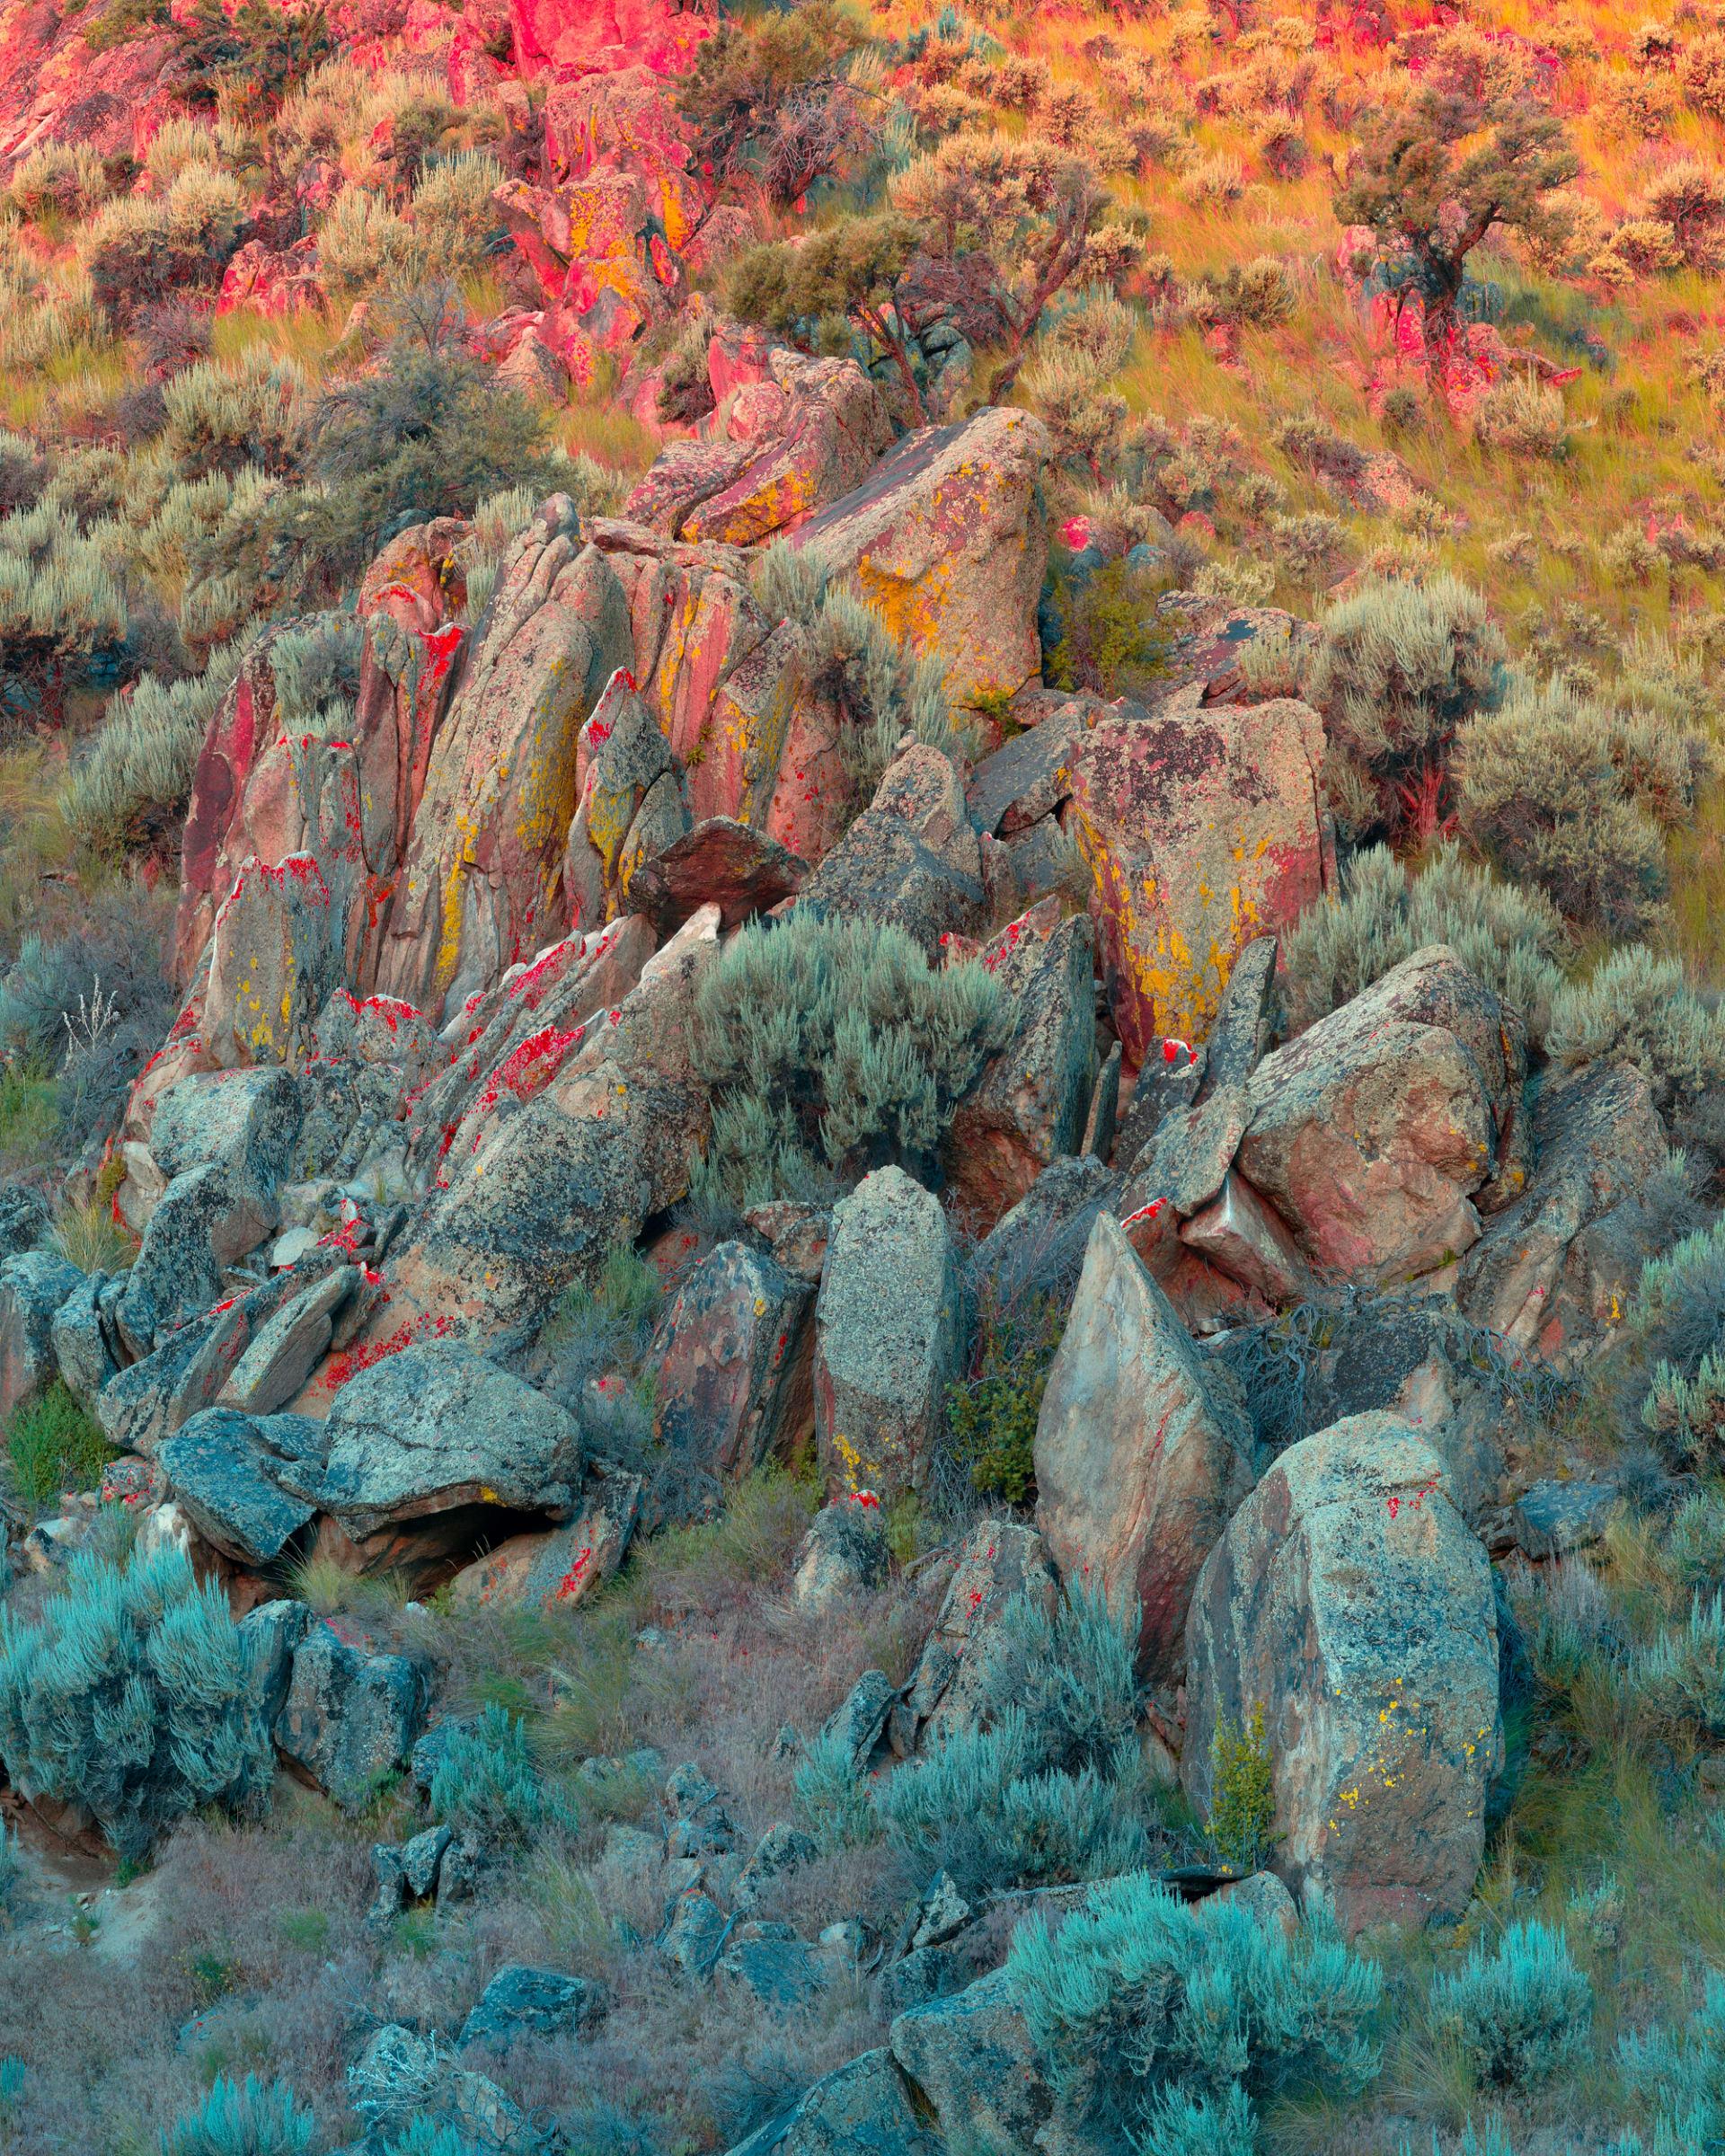 "<span class=""link fancybox-details-link""><a href=""/artists/79-christopher-rodriguez/works/865-christopher-rodriguez-granite-gradient-mt-2018/"">View Detail Page</a></span><div class=""artist""><strong>Christopher Rodriguez</strong></div> <div class=""title""><em>Granite & Gradient, MT</em>, 2018</div> <div class=""medium"">Archival Pigment Print</div> <div class=""dimensions"">40 x 32 inches</div>"